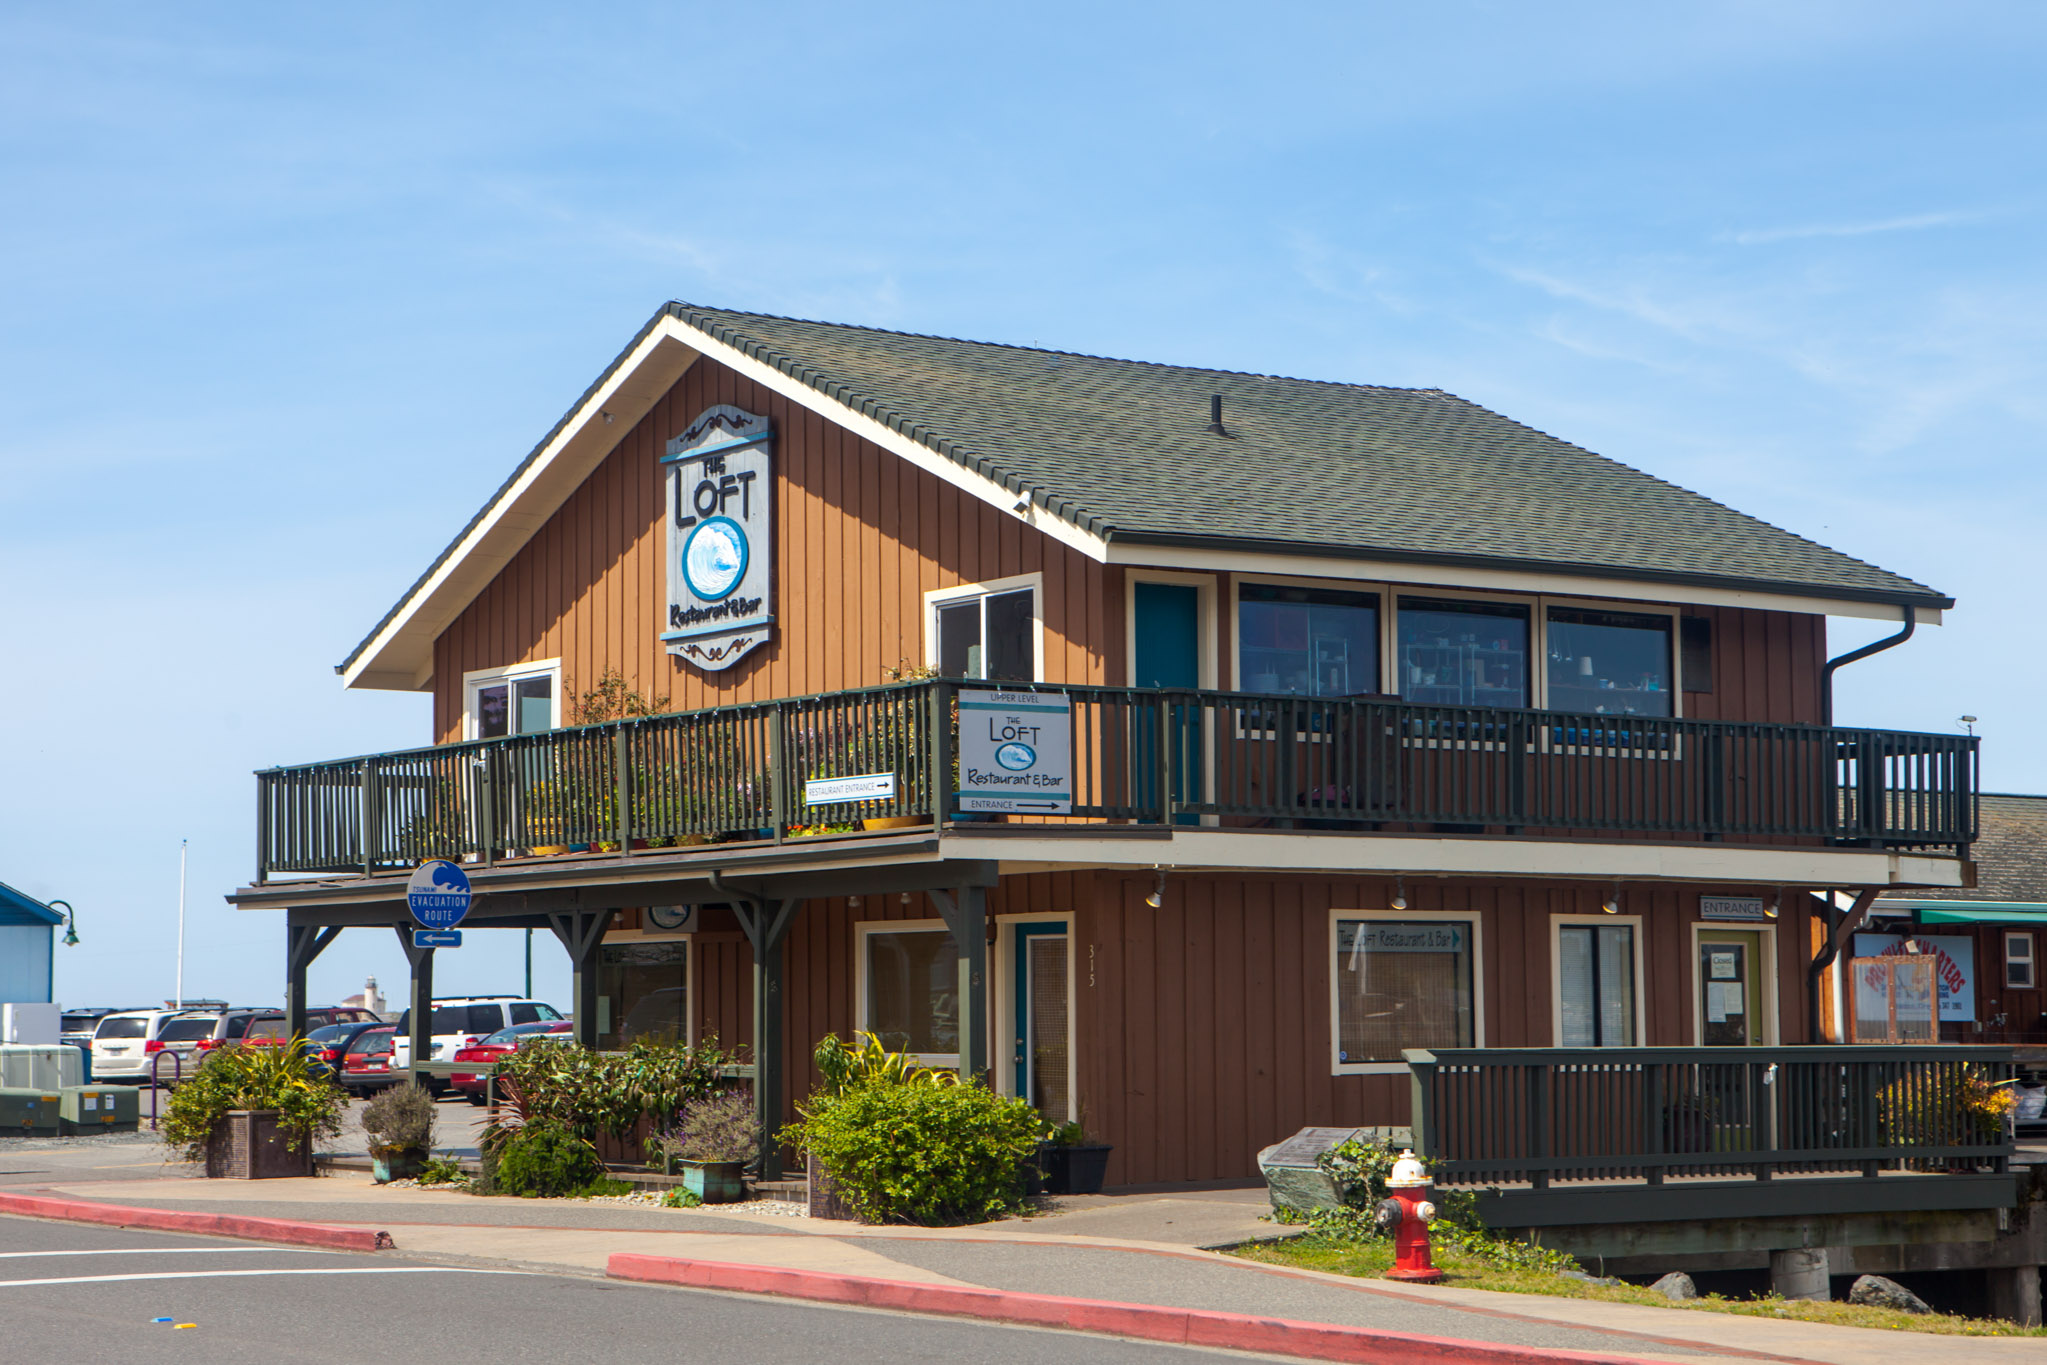 The Loft Restaurant amp Bar Best Western Inn at Face Rock : Old Town Bandon Oregon 18 from www.innatfacerock.com size 2047 x 1365 jpeg 565kB